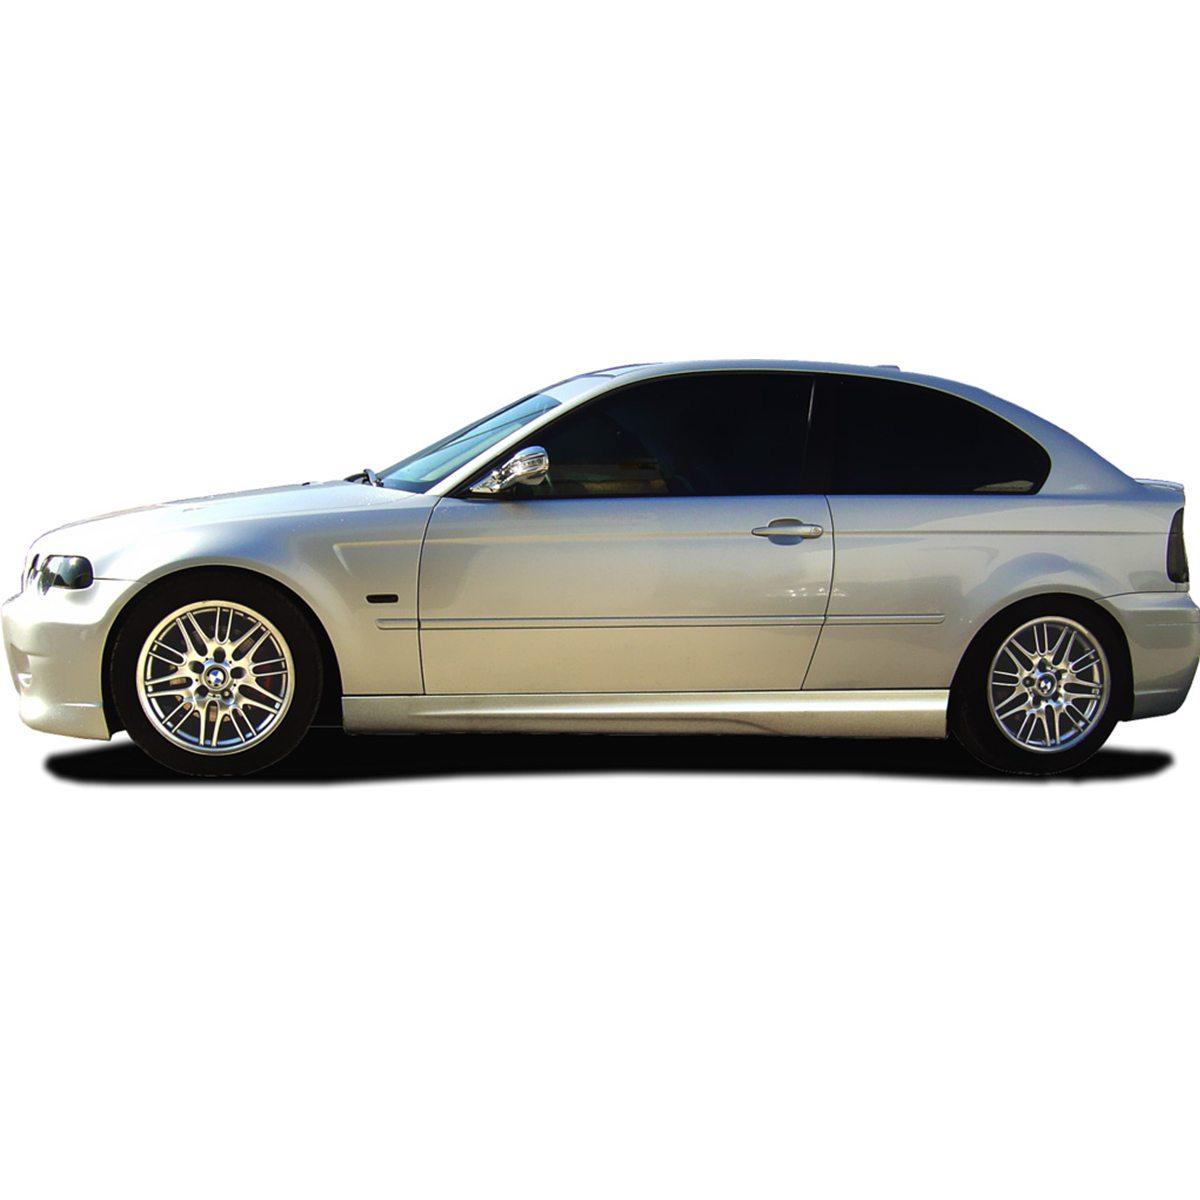 BMW-E46-Compact-M3-Sport-emb-EBU0010.1-1